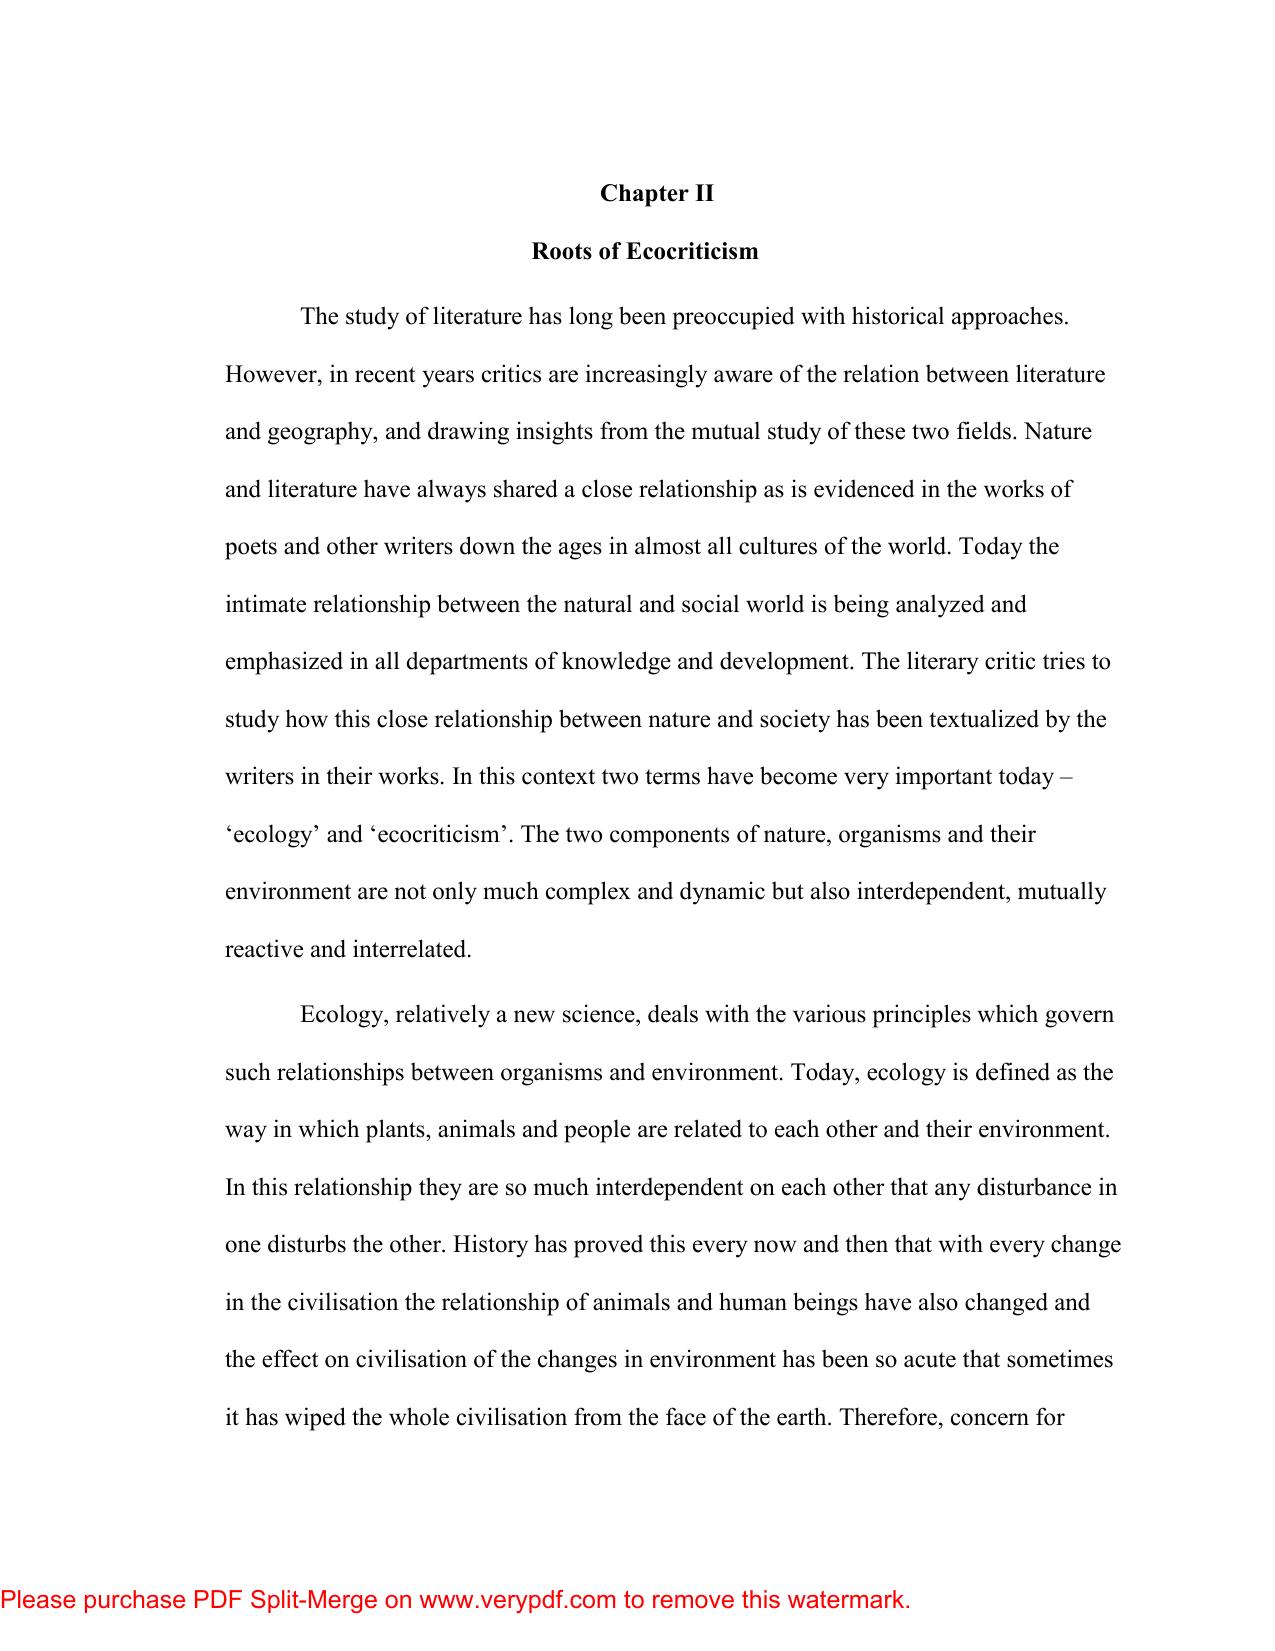 william rueckert literature and ecology